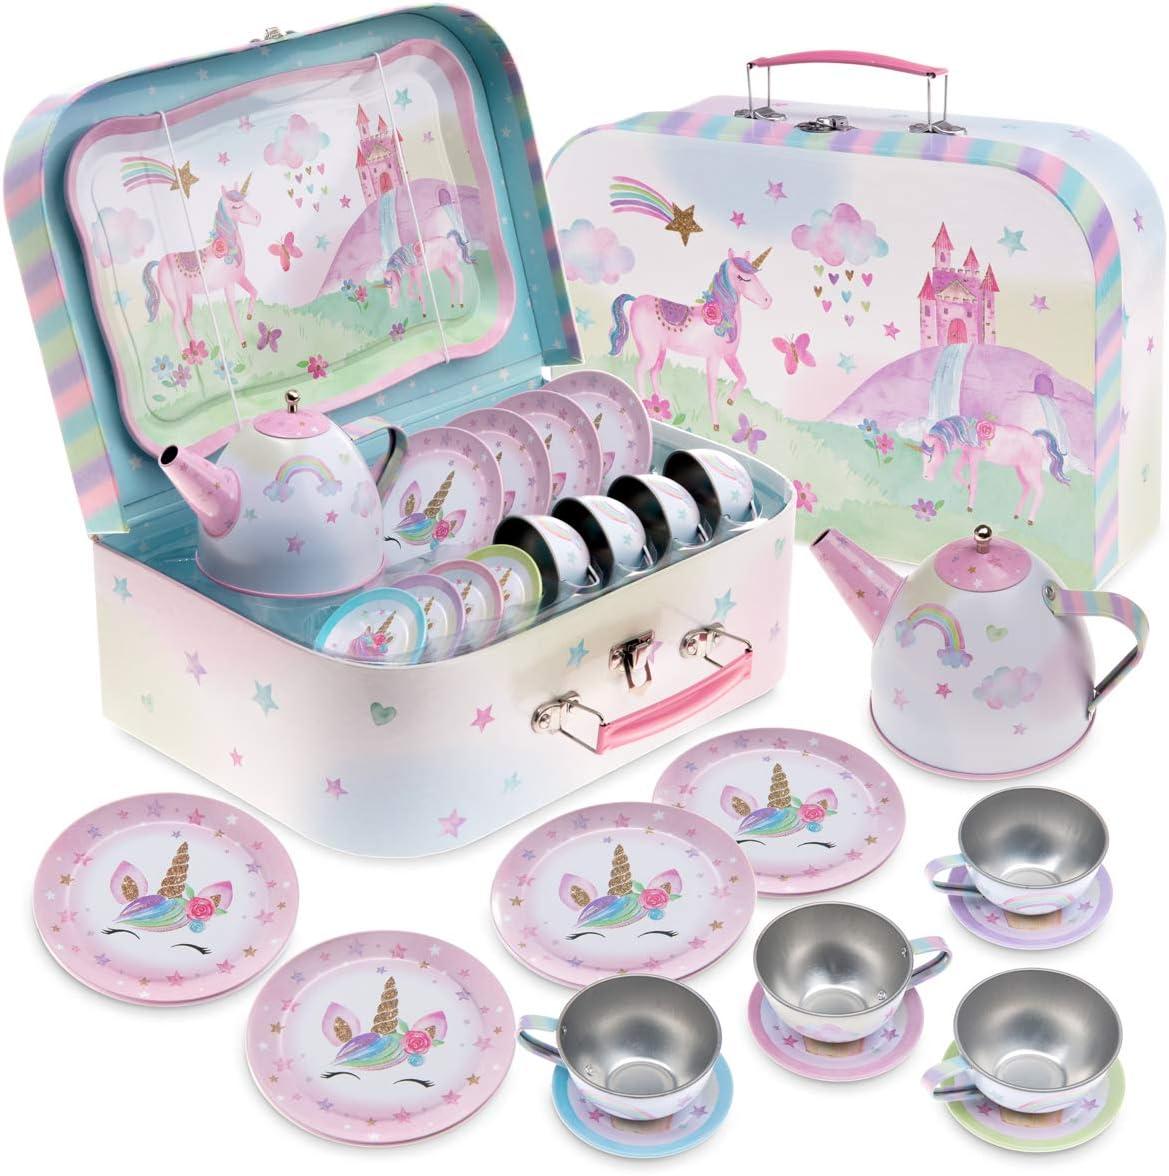 Jewelkeeper 15 Piece Kids Pretend Toy Tin Tea Set & Carrying Case - Party Unicorn Design